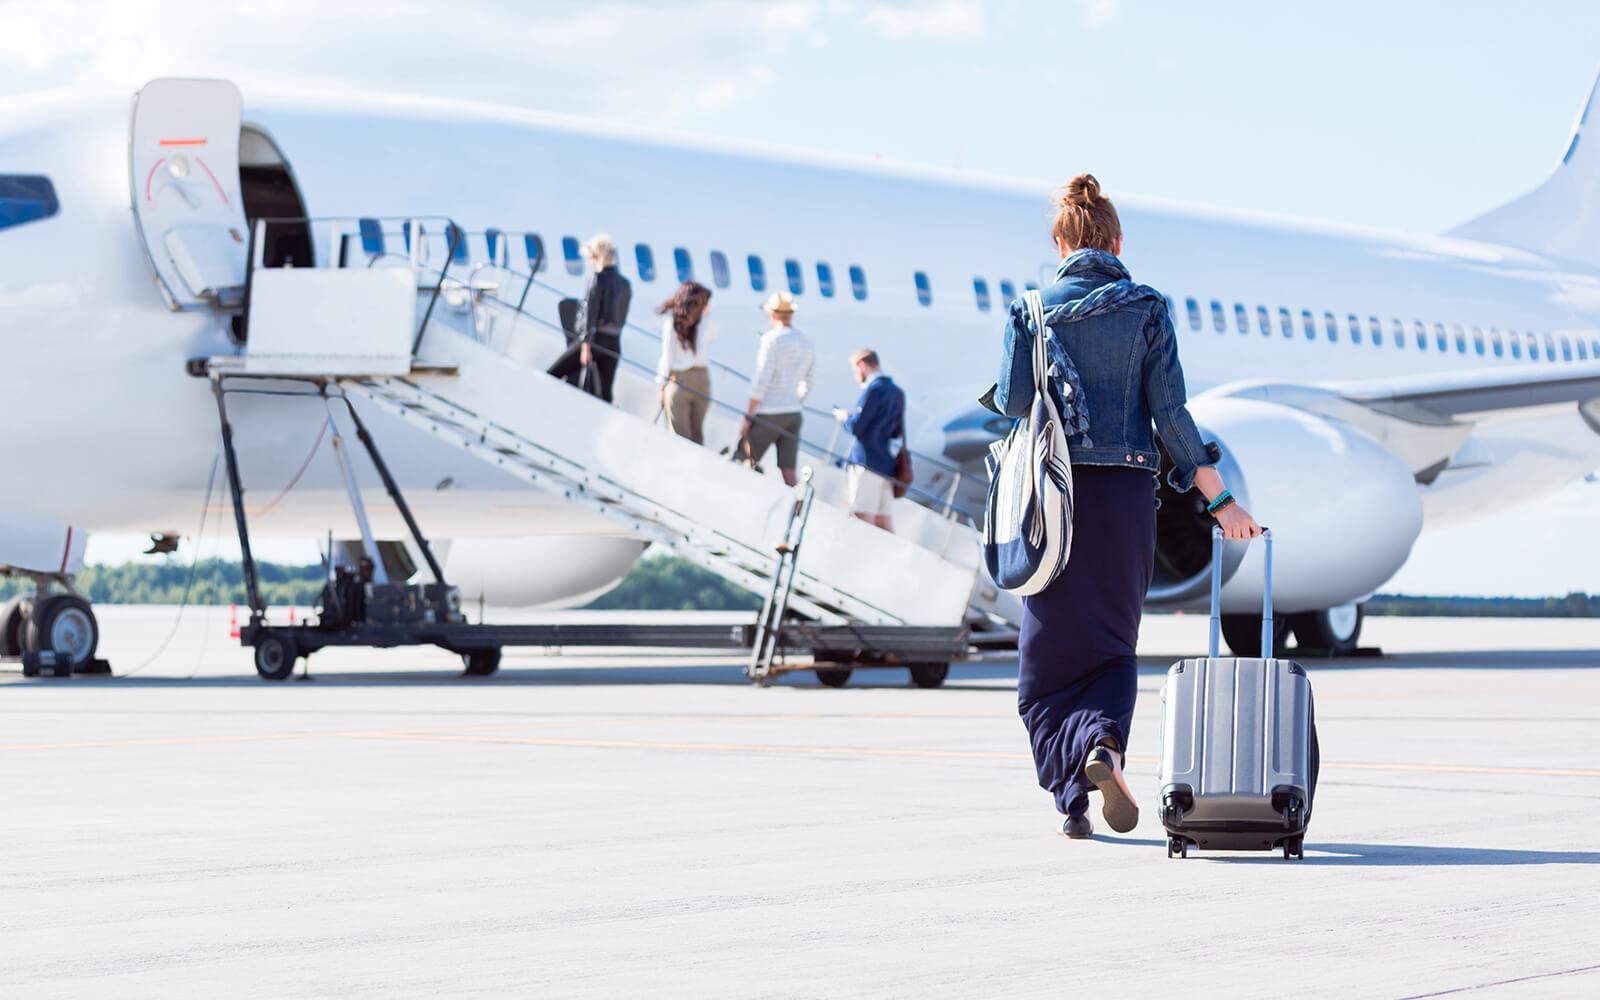 Anreise Flugzeug Oberdeck Hamburg